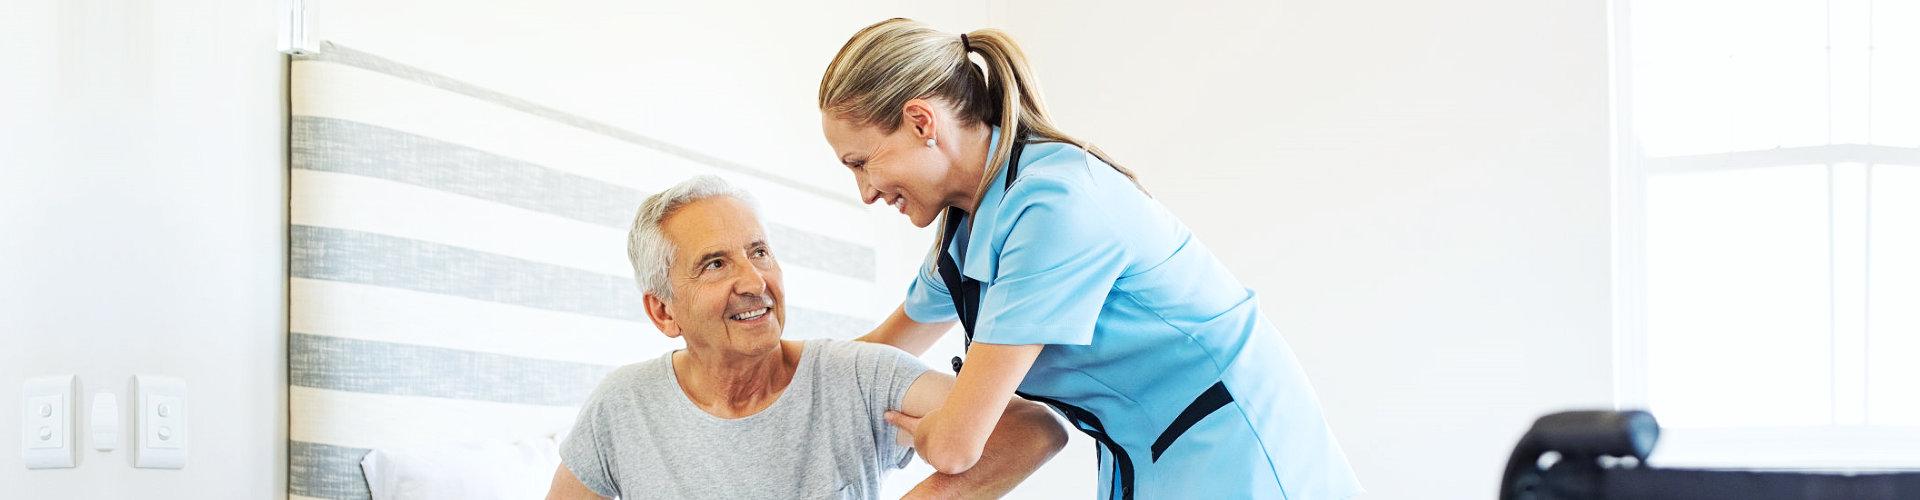 staff assisting elderly man